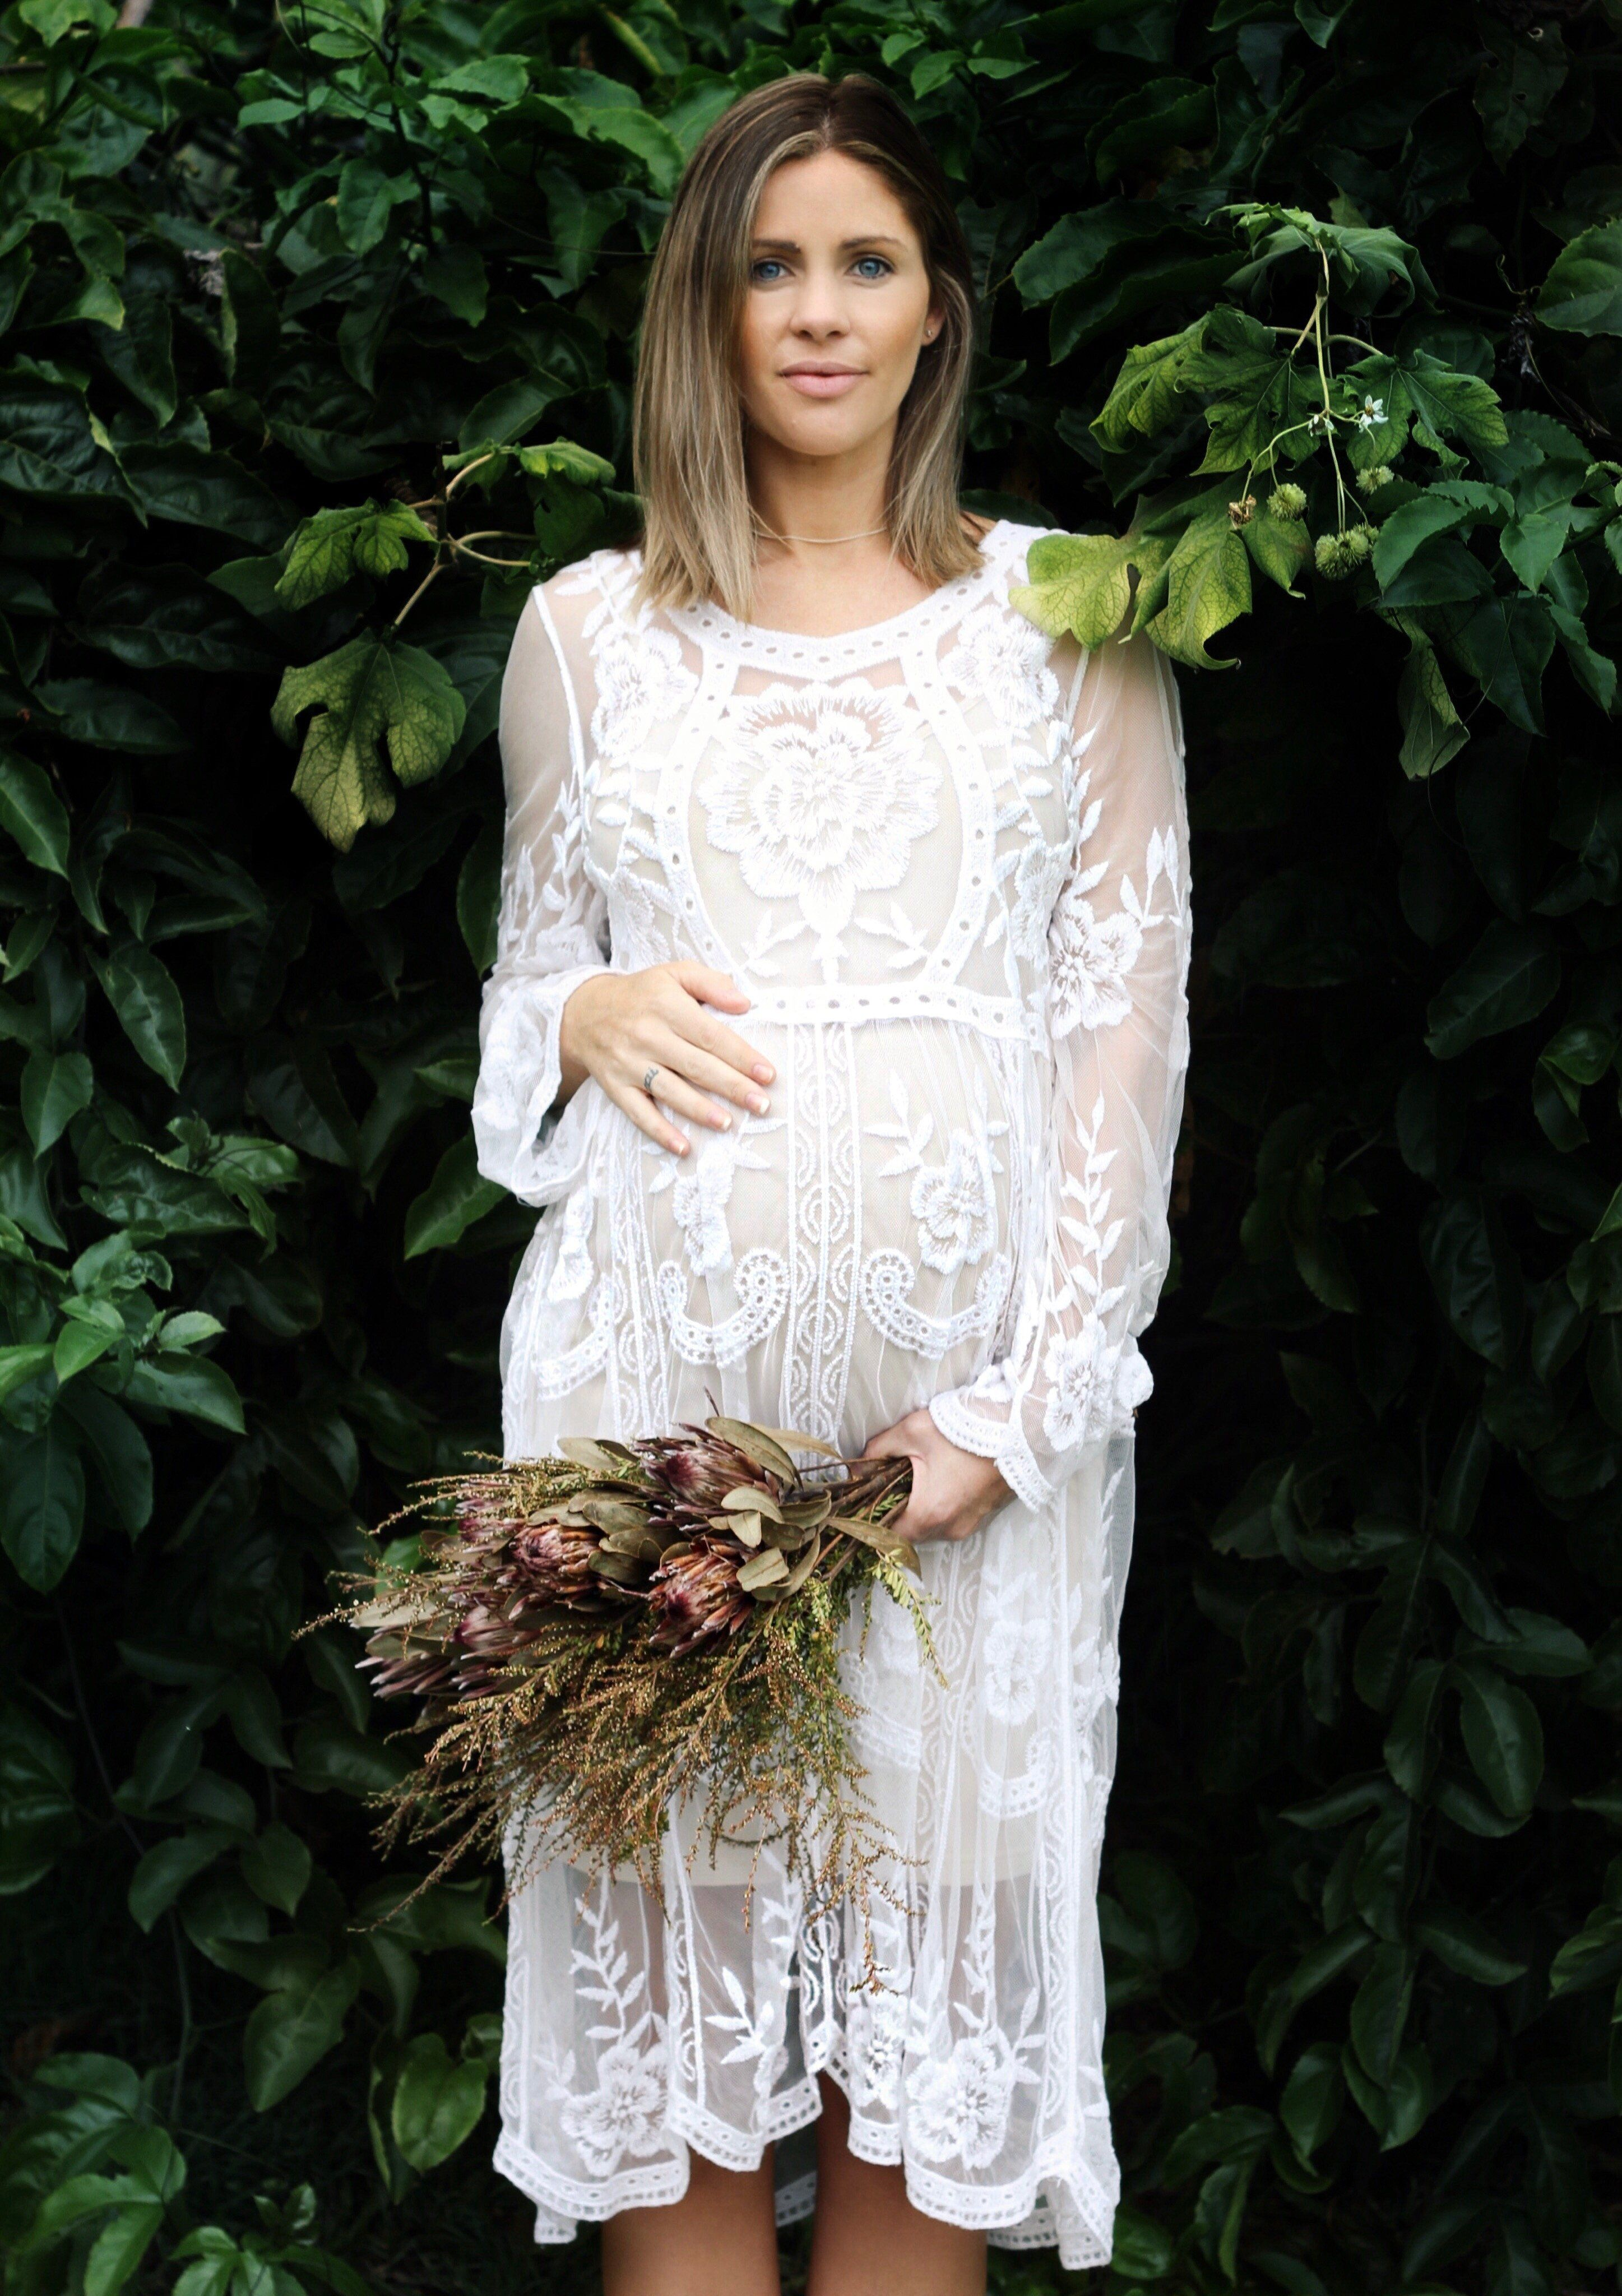 Coven co raven boho dress perfect bohemian crochet lace raven boho dress perfect bohemian crochet lace maternity dress pregnancy pregnant ombrellifo Choice Image